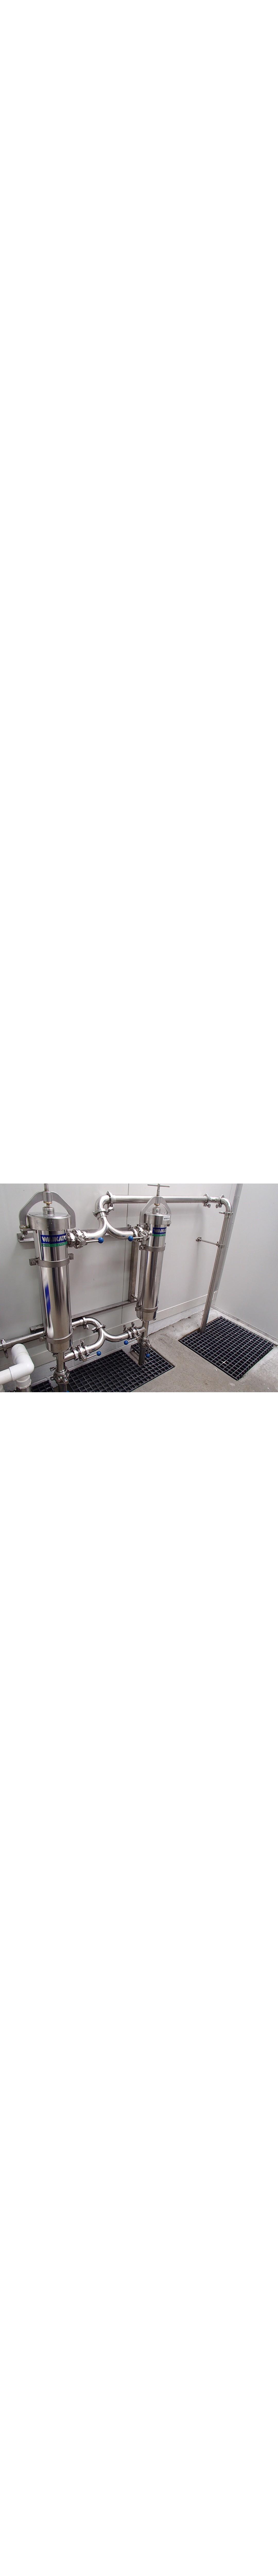 Stainless Steel Milk Filters